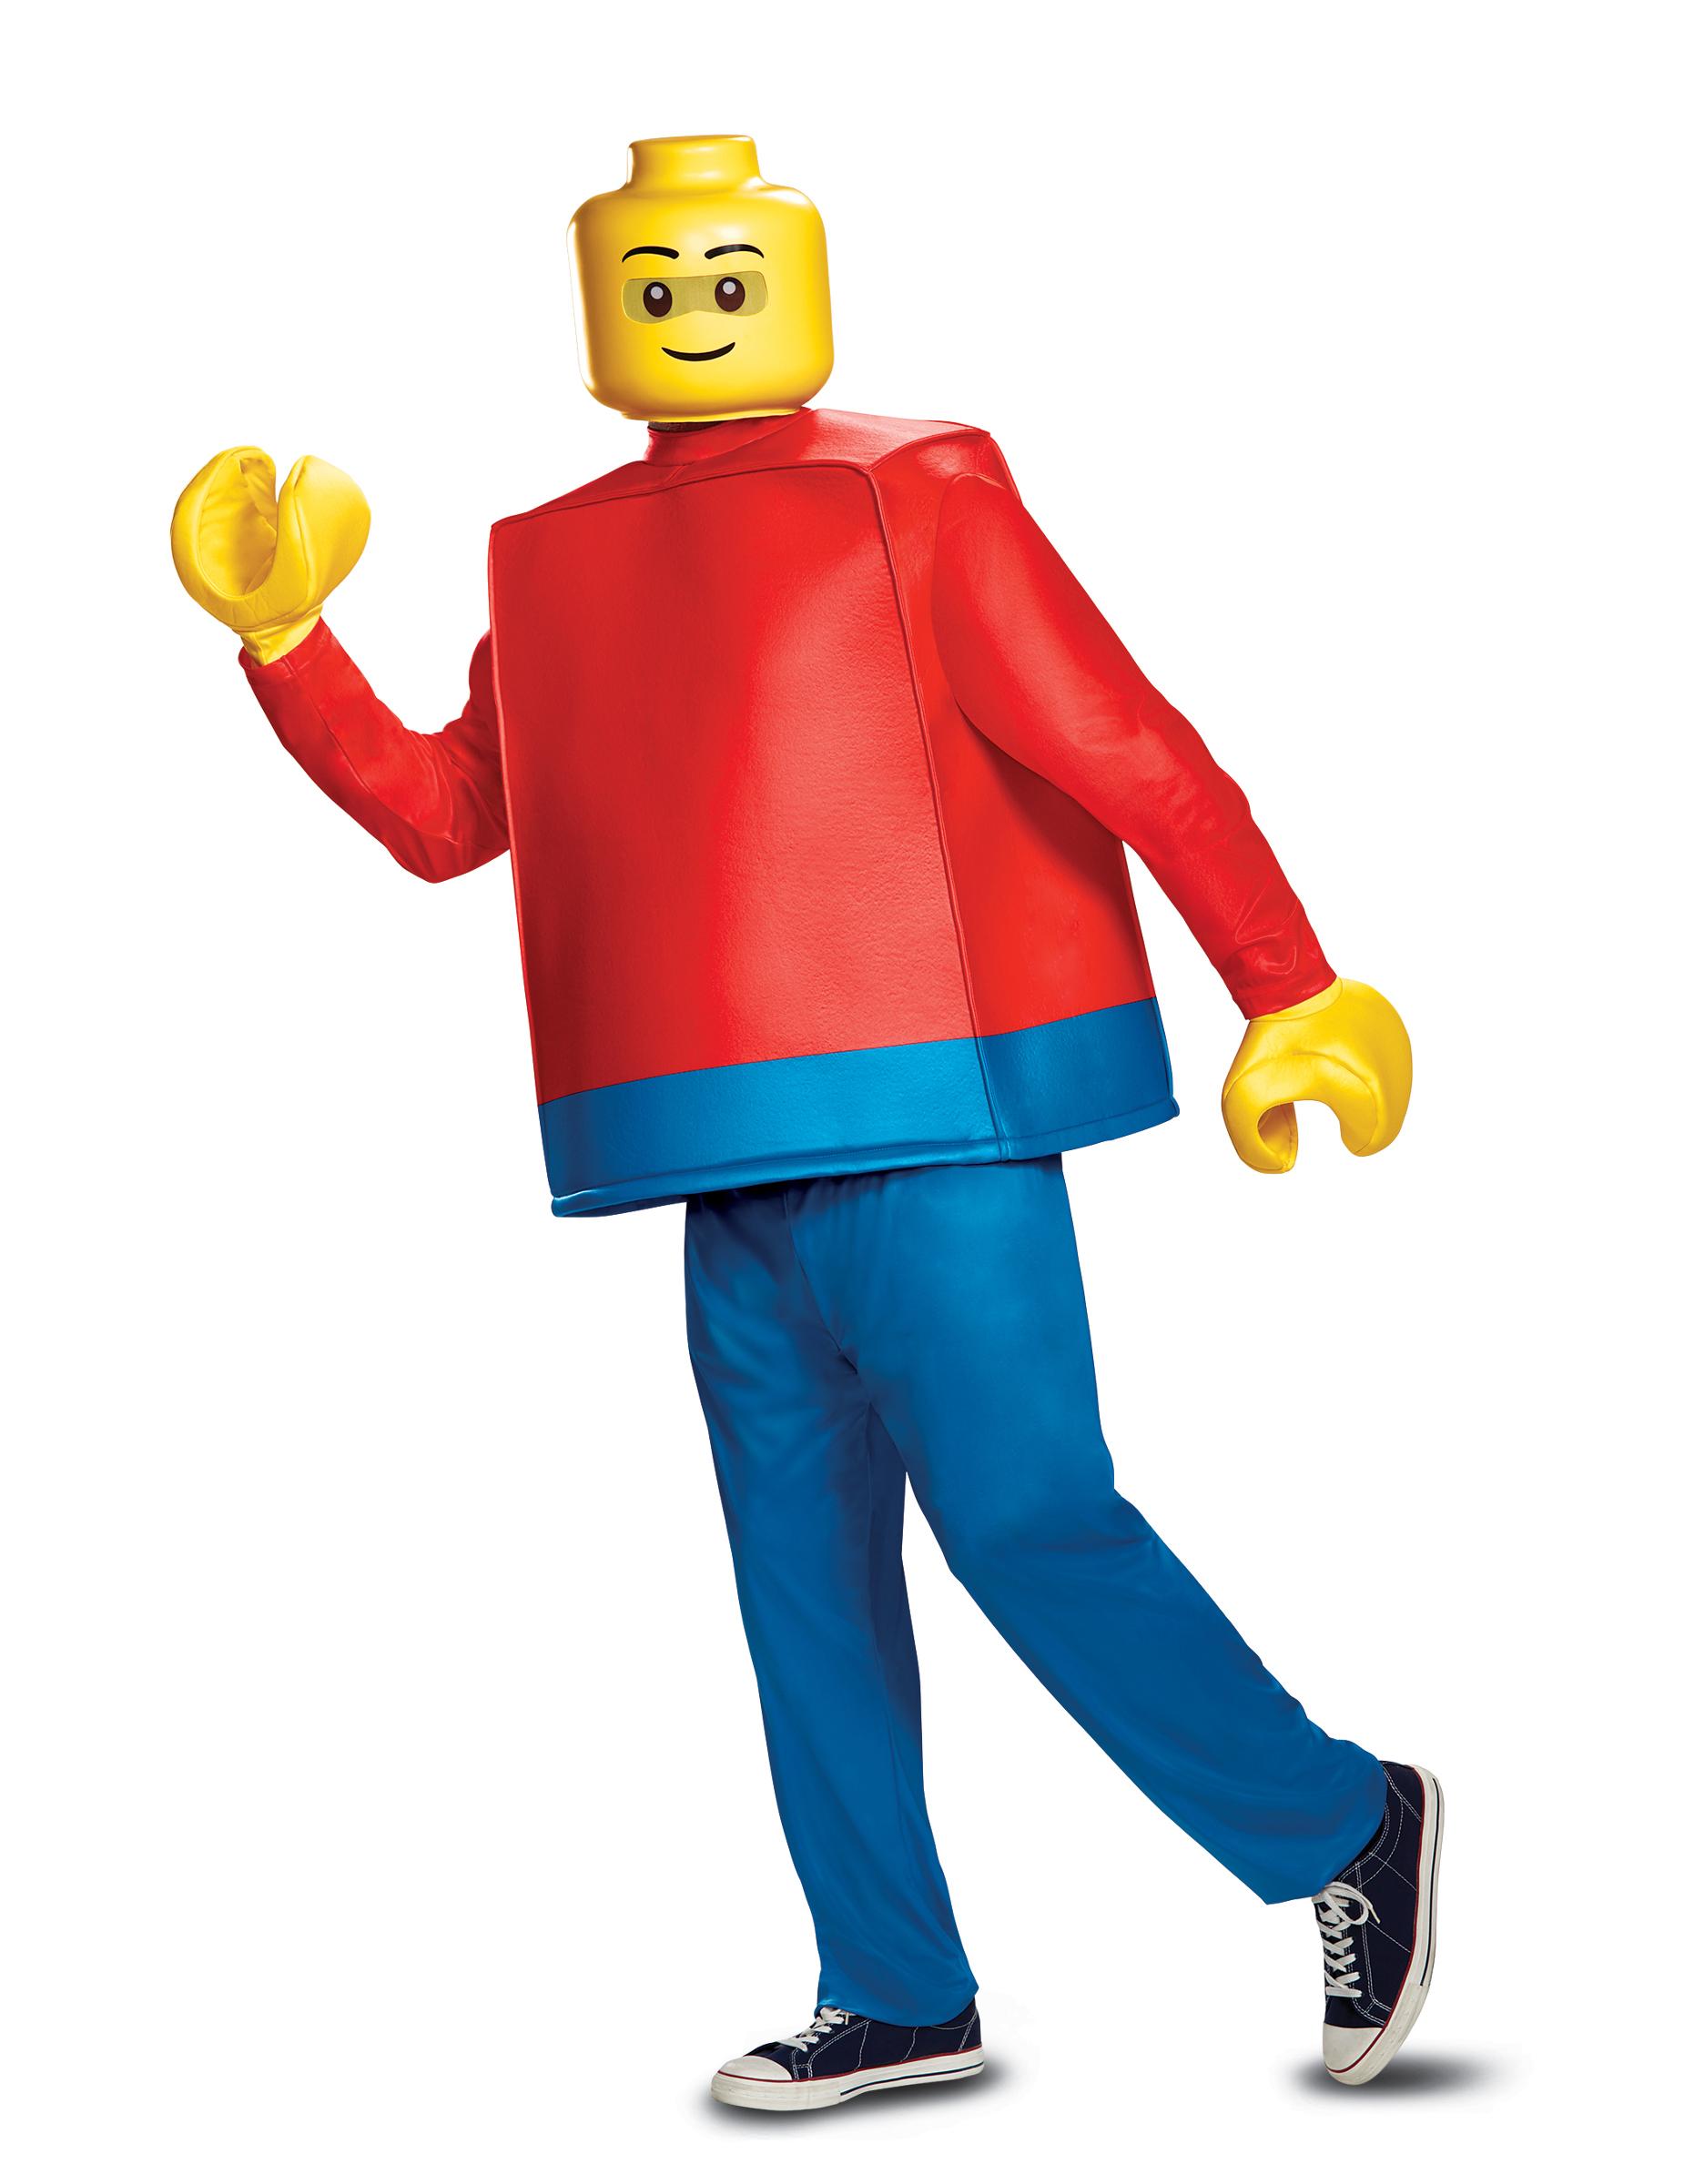 lego figur lizenzkost m f r erwachsene blau gelb rot. Black Bedroom Furniture Sets. Home Design Ideas